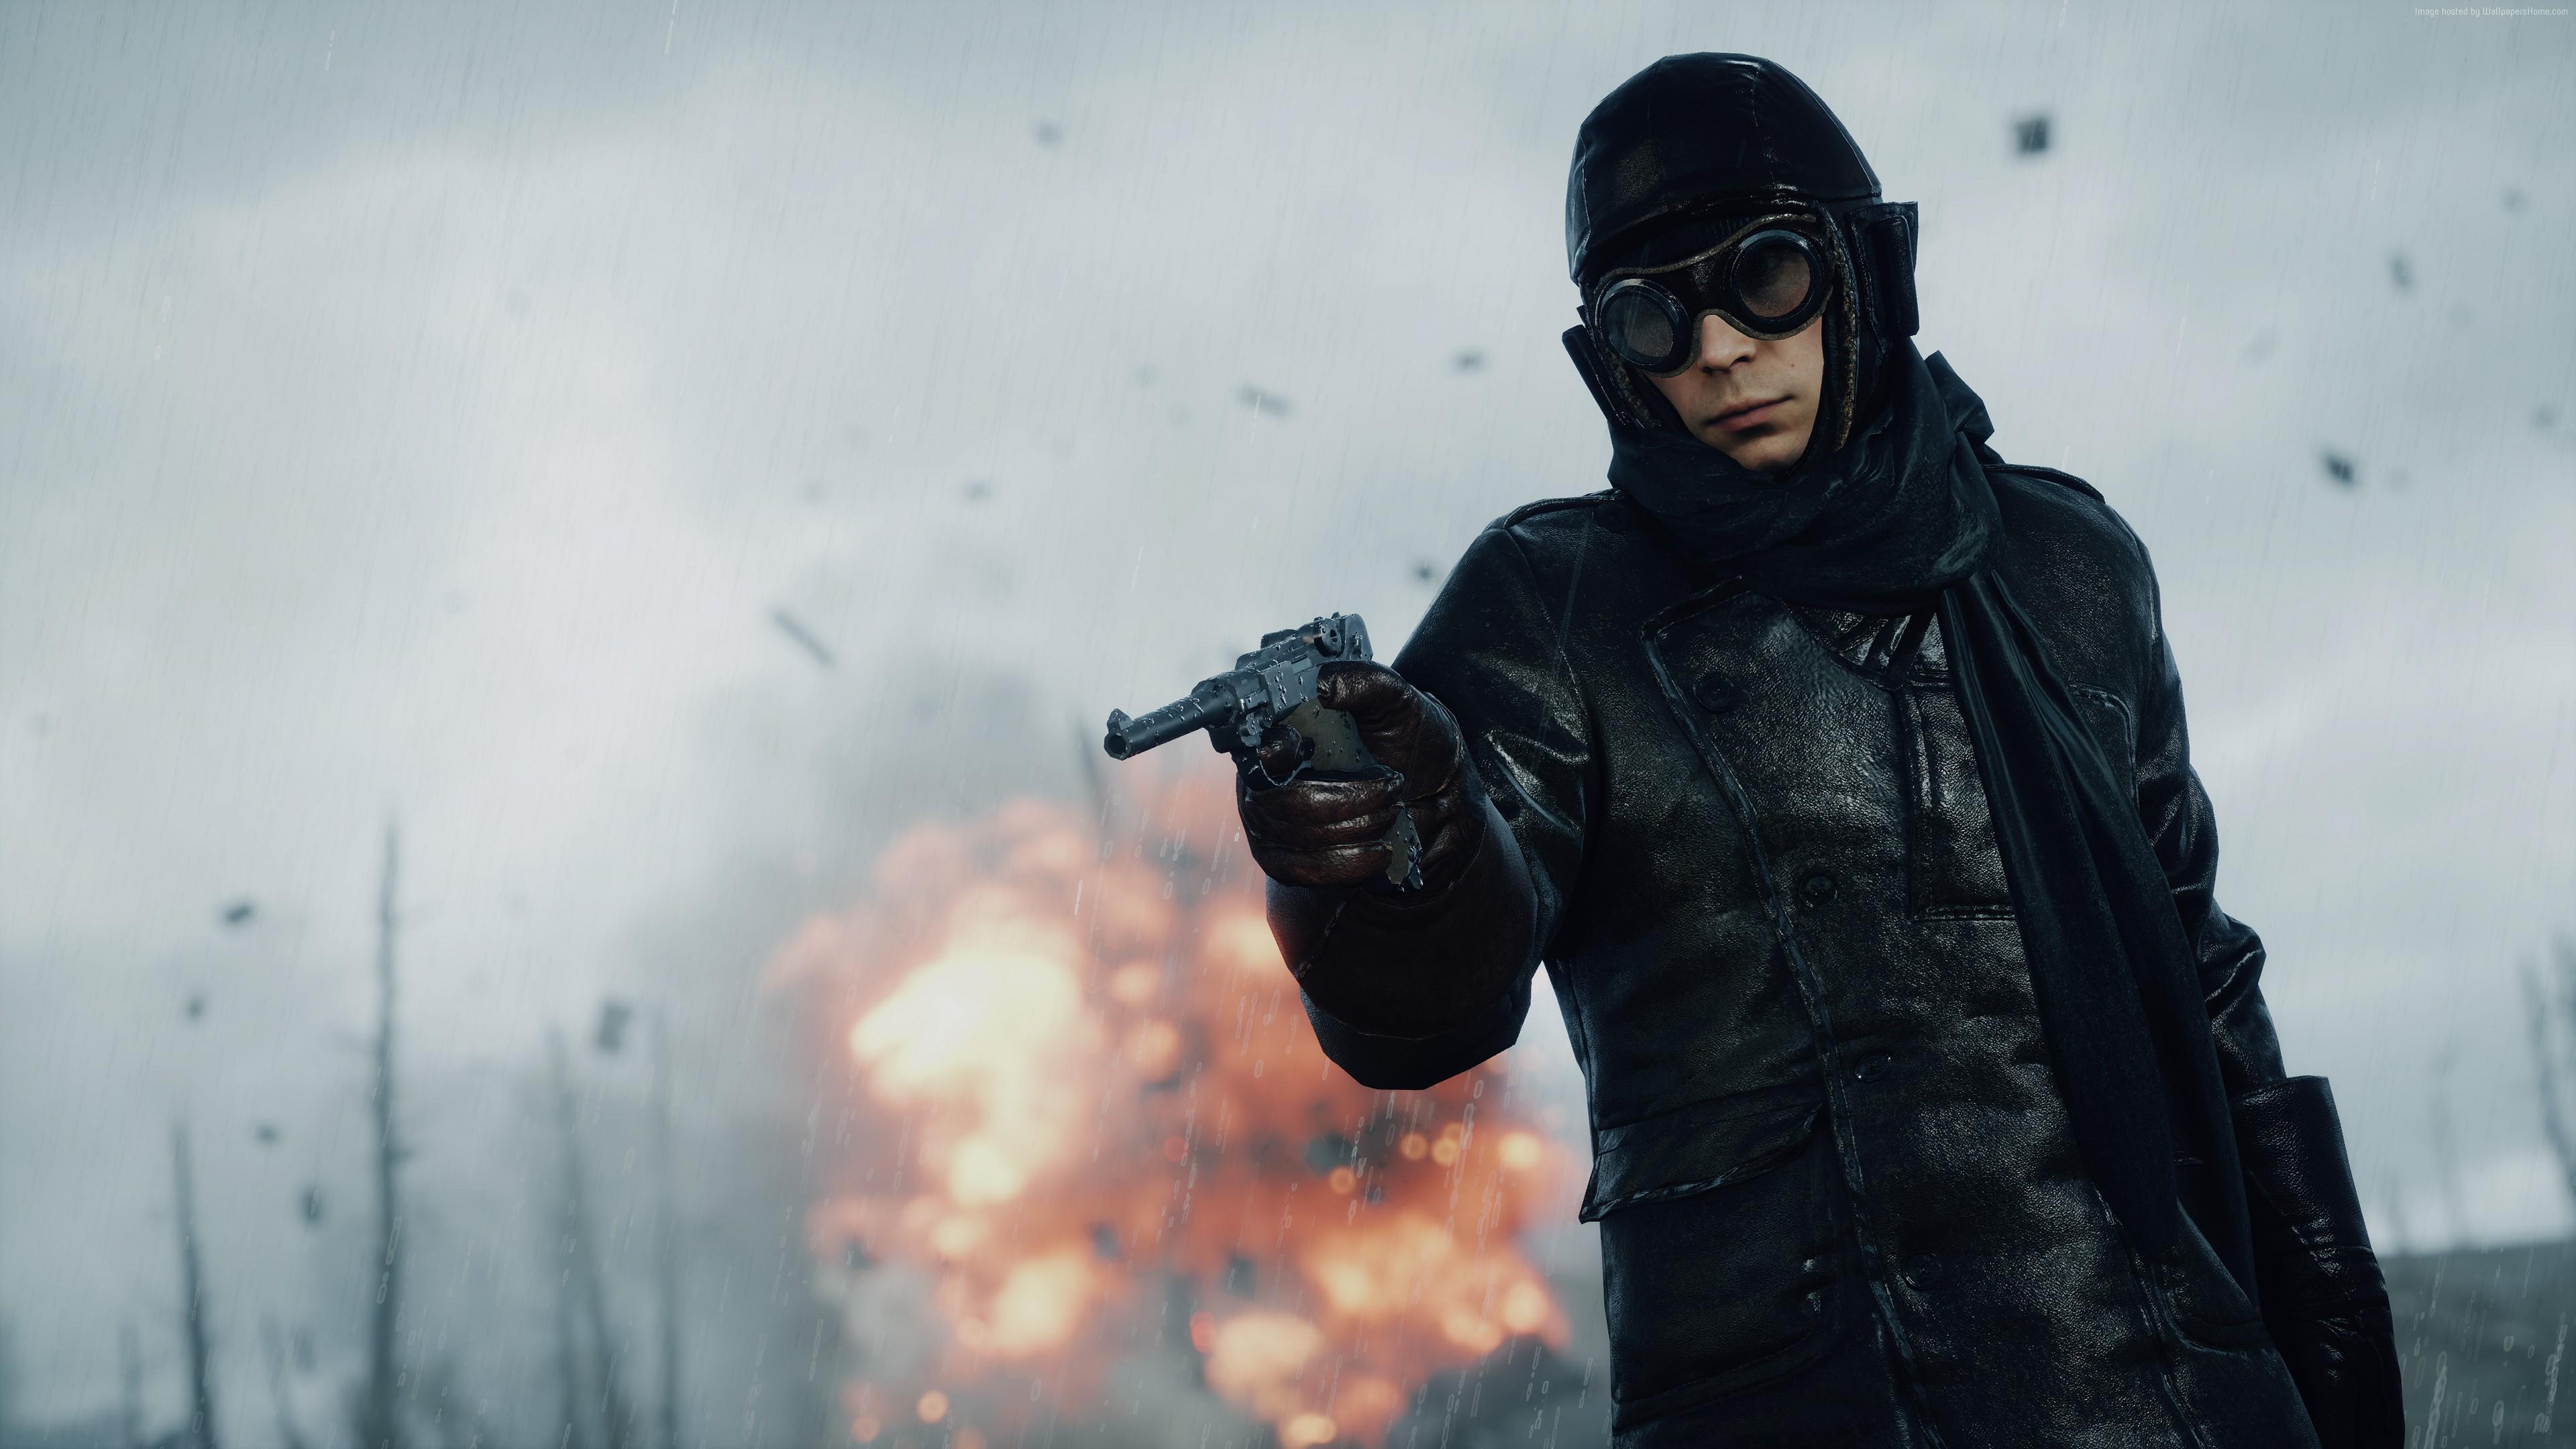 Battlefield 1 4k, HD Games, 4k Wallpapers, Images